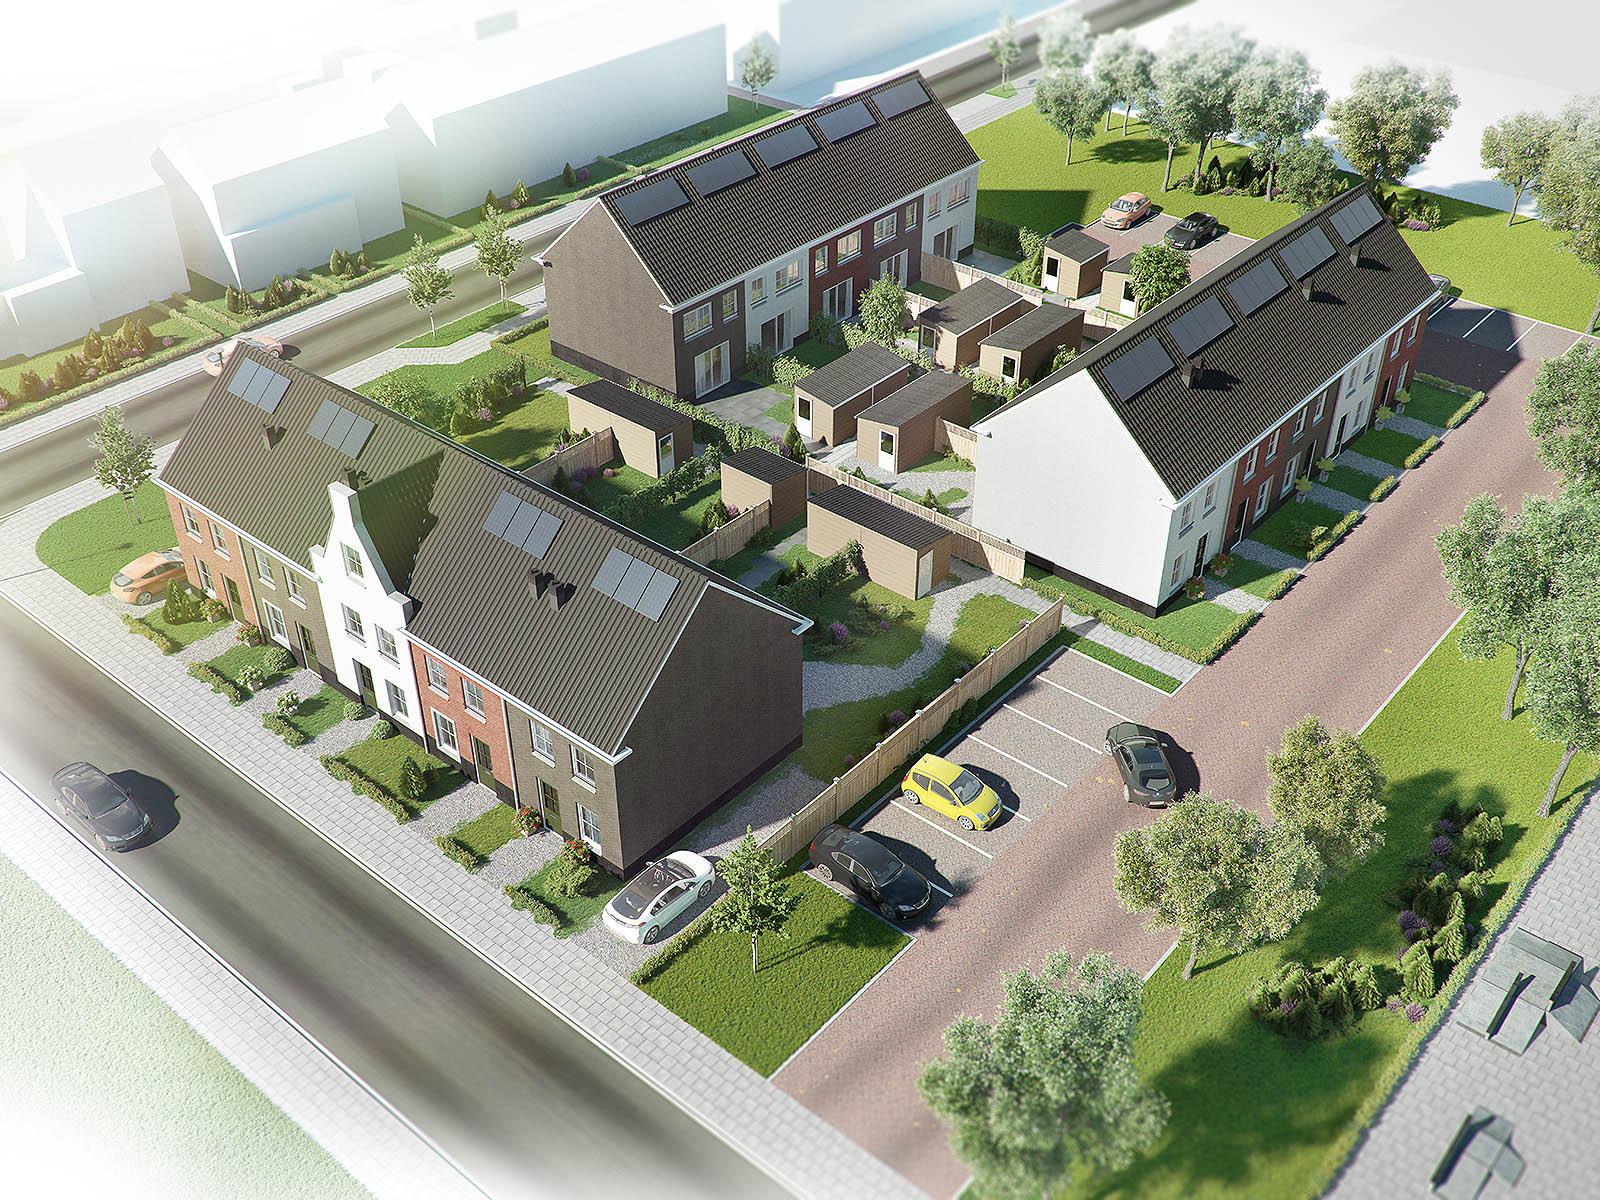 exterieur visualisatie DWanimations vogelvlucht Hollands wonen